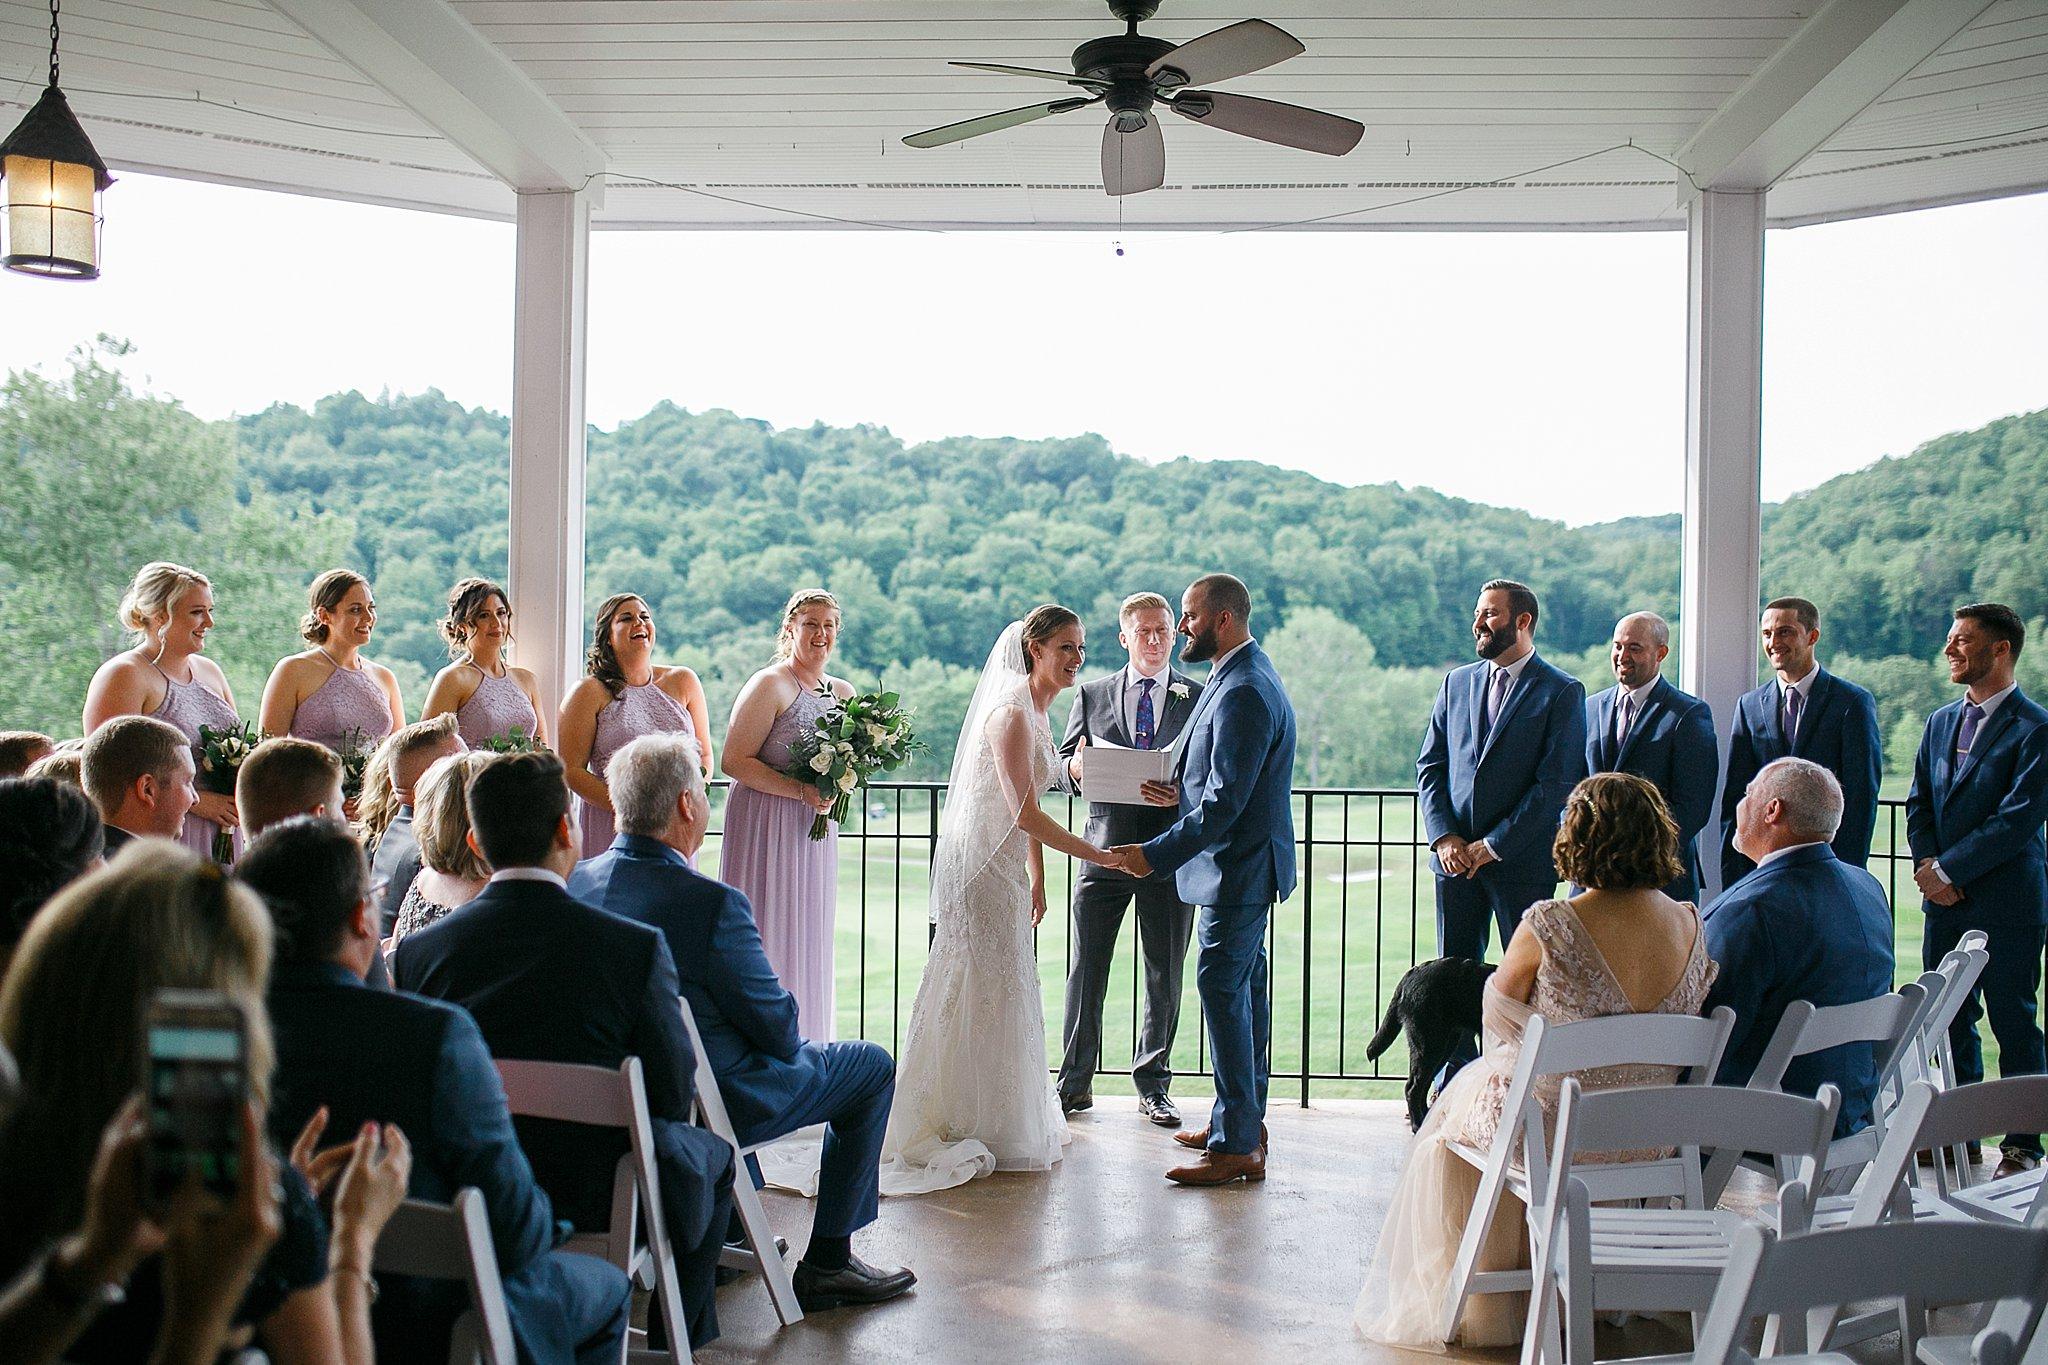 Hollow Brook Golf Club Cortlandt Manor NY Wedding Sweet Alice Photography June Wedding82.jpg